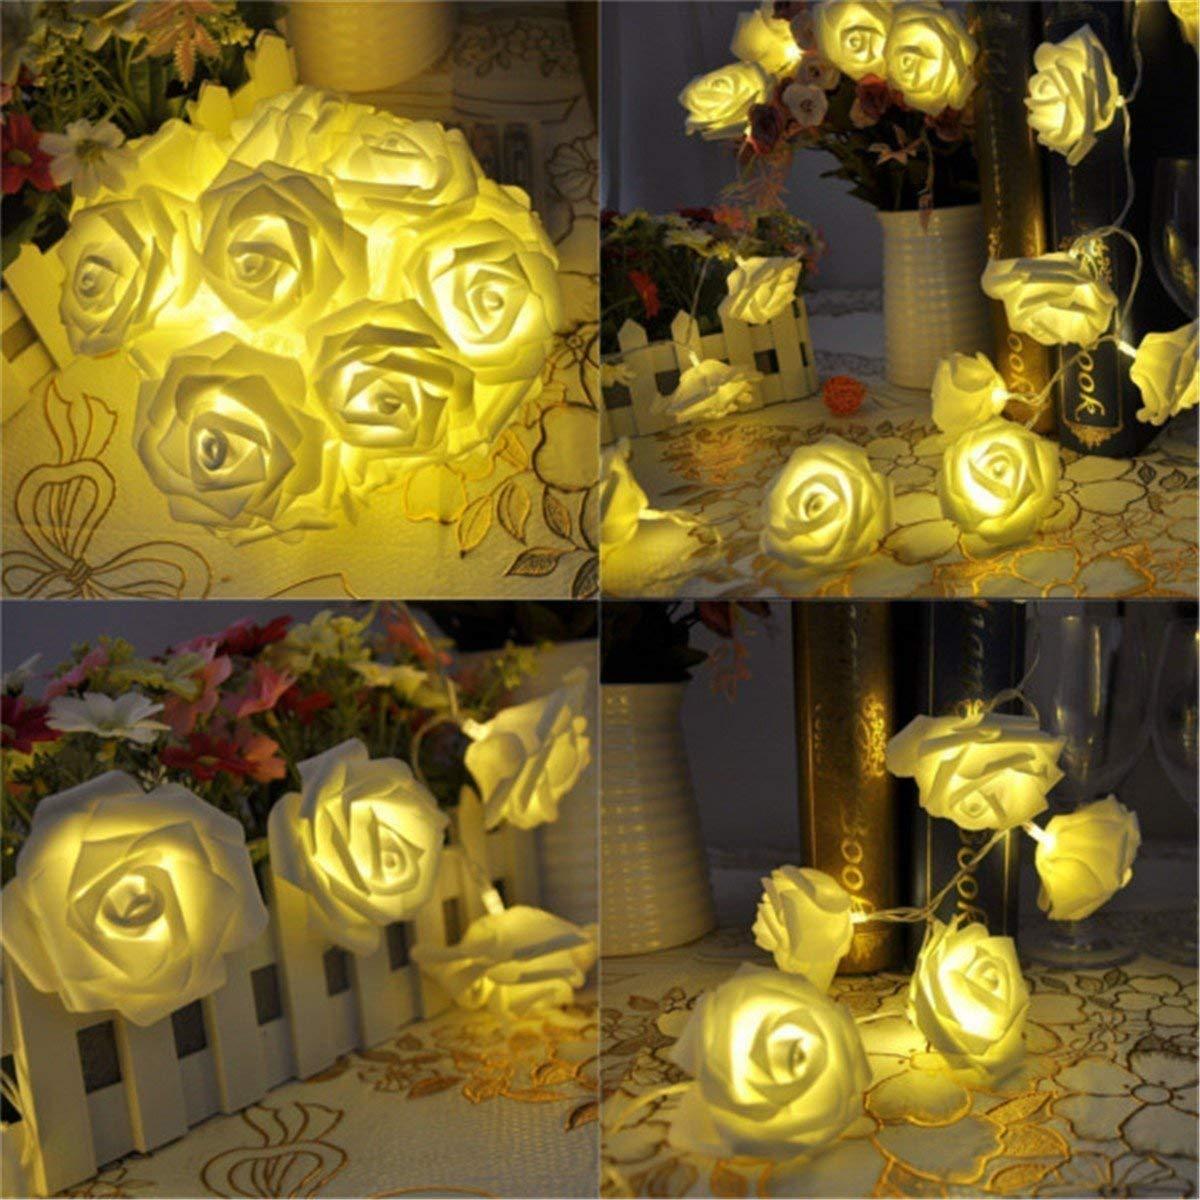 Citra 28 Led String Strip Light Rose Flower Shape Diwali Light for Decoration 28Led- Warm White